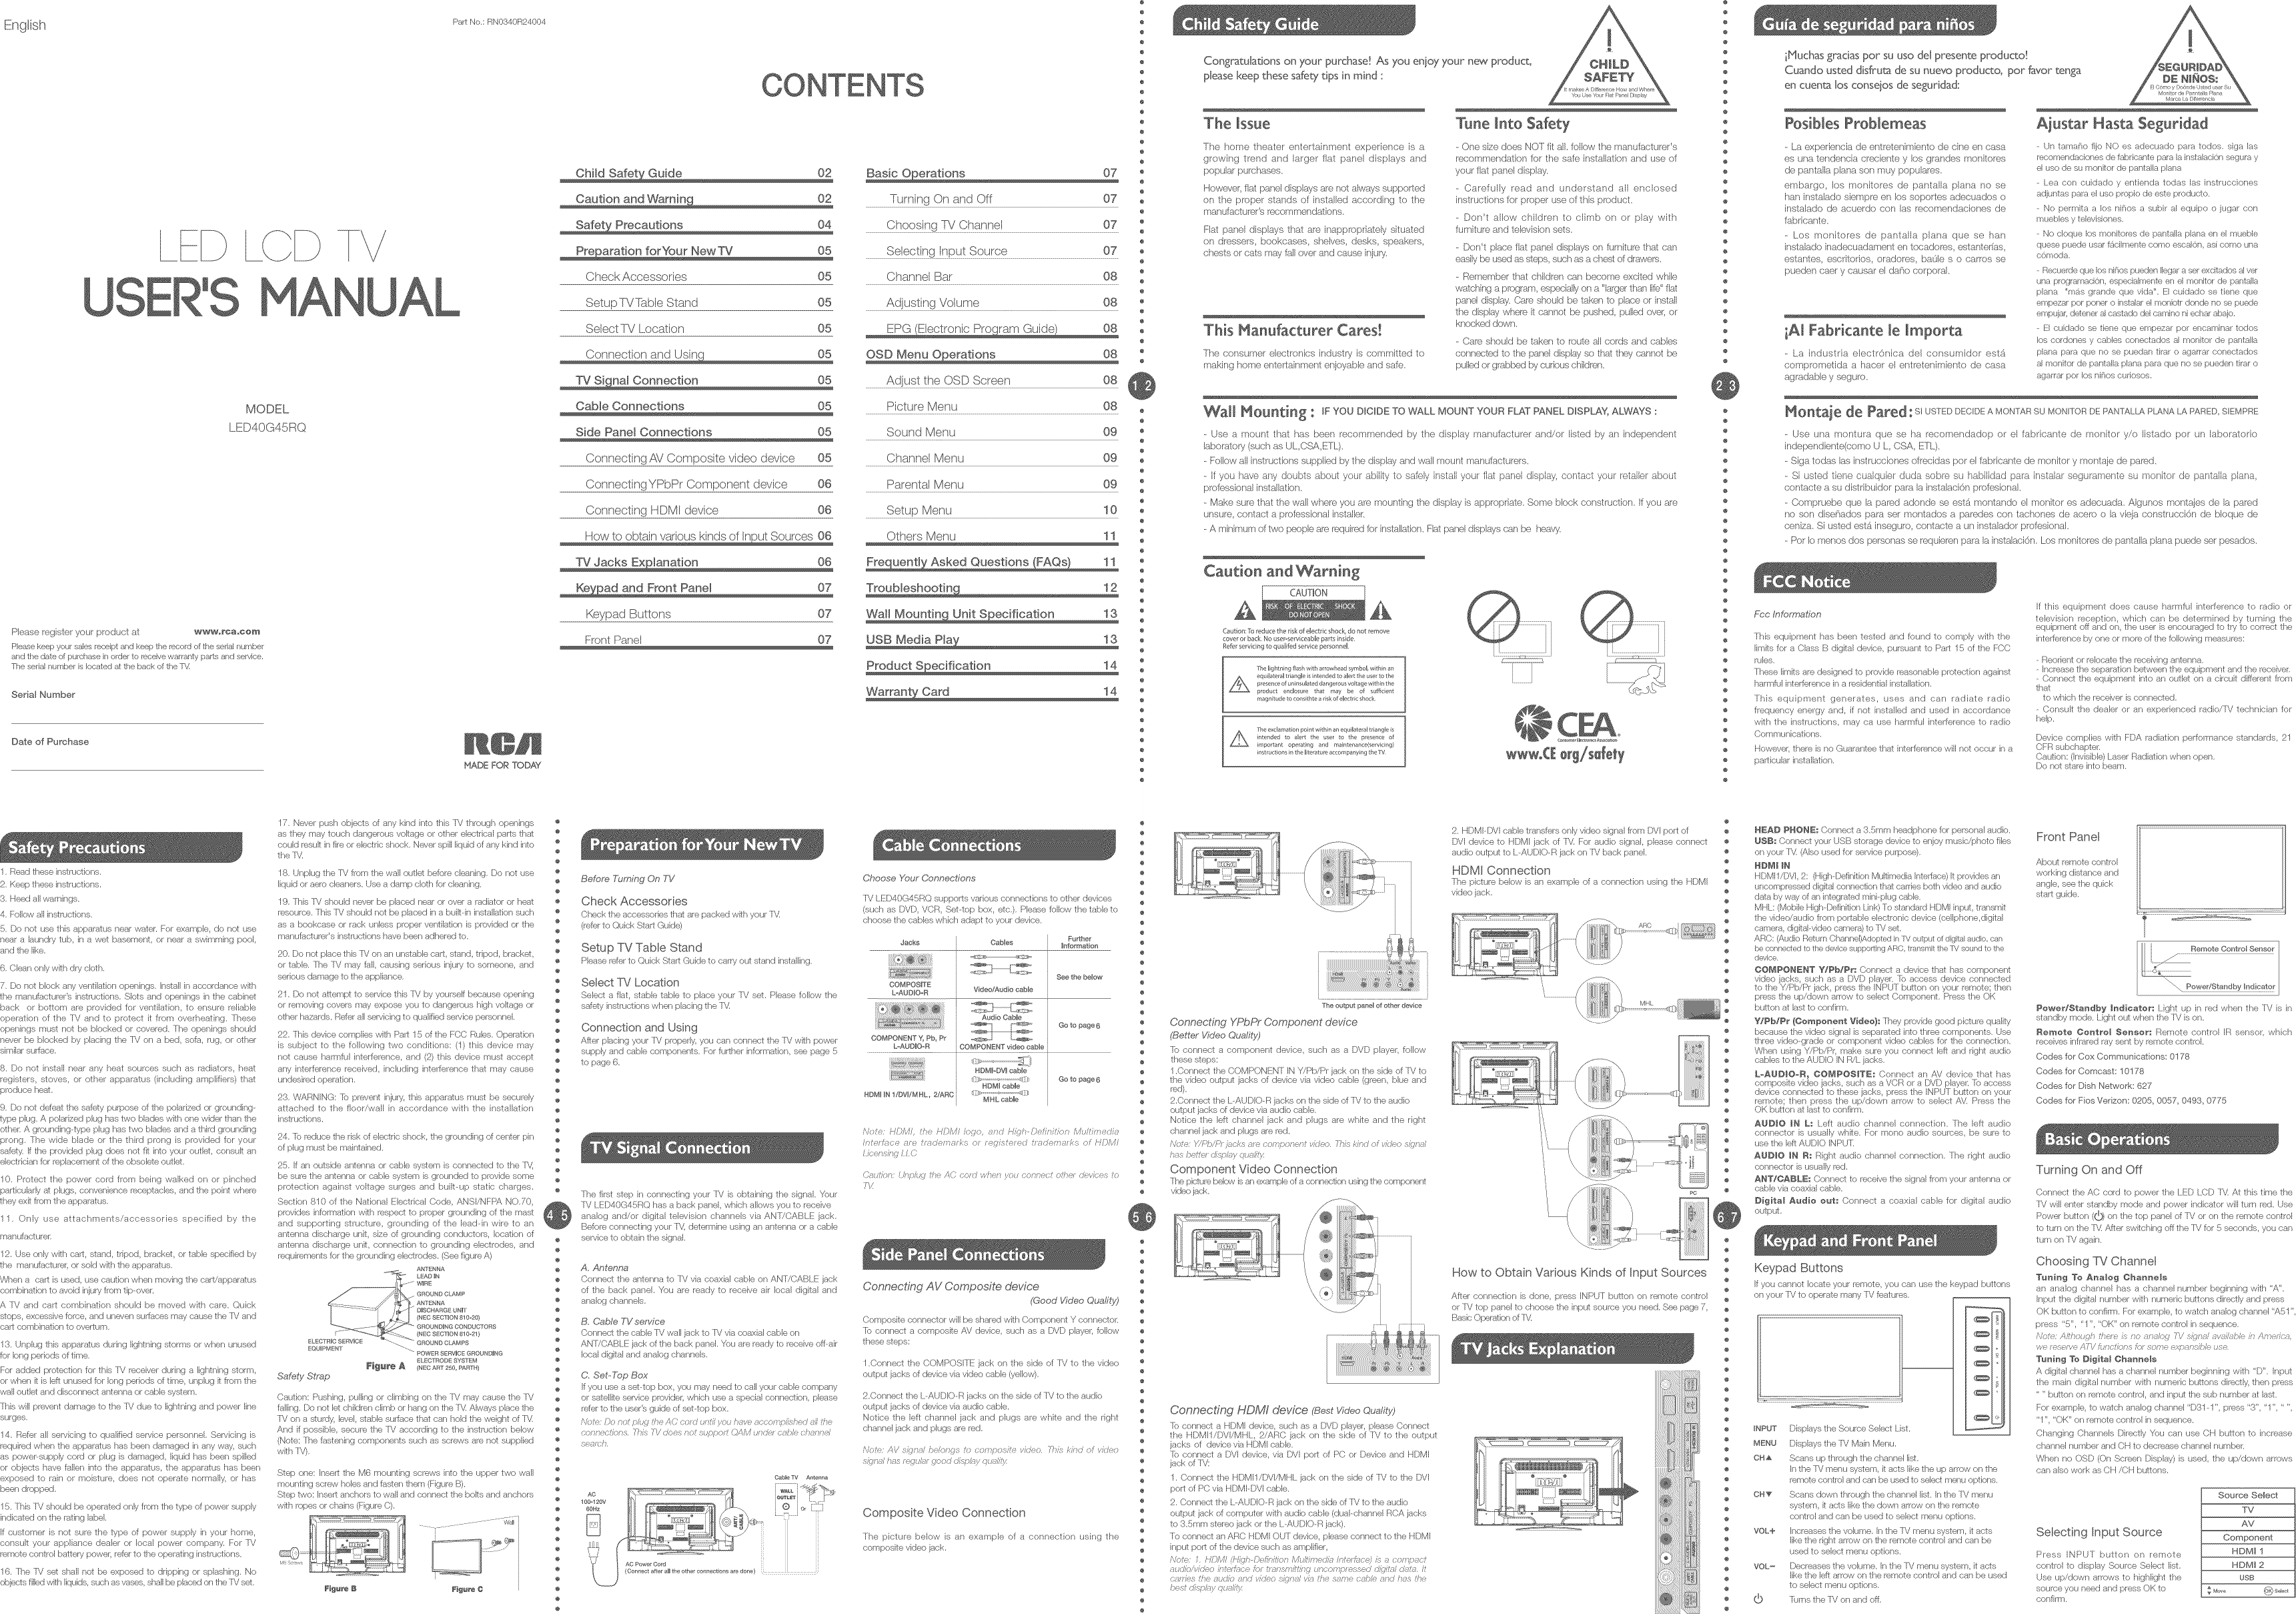 Rca Led40g45rq User Manual Led Tv Manuals And Guides 1405186l